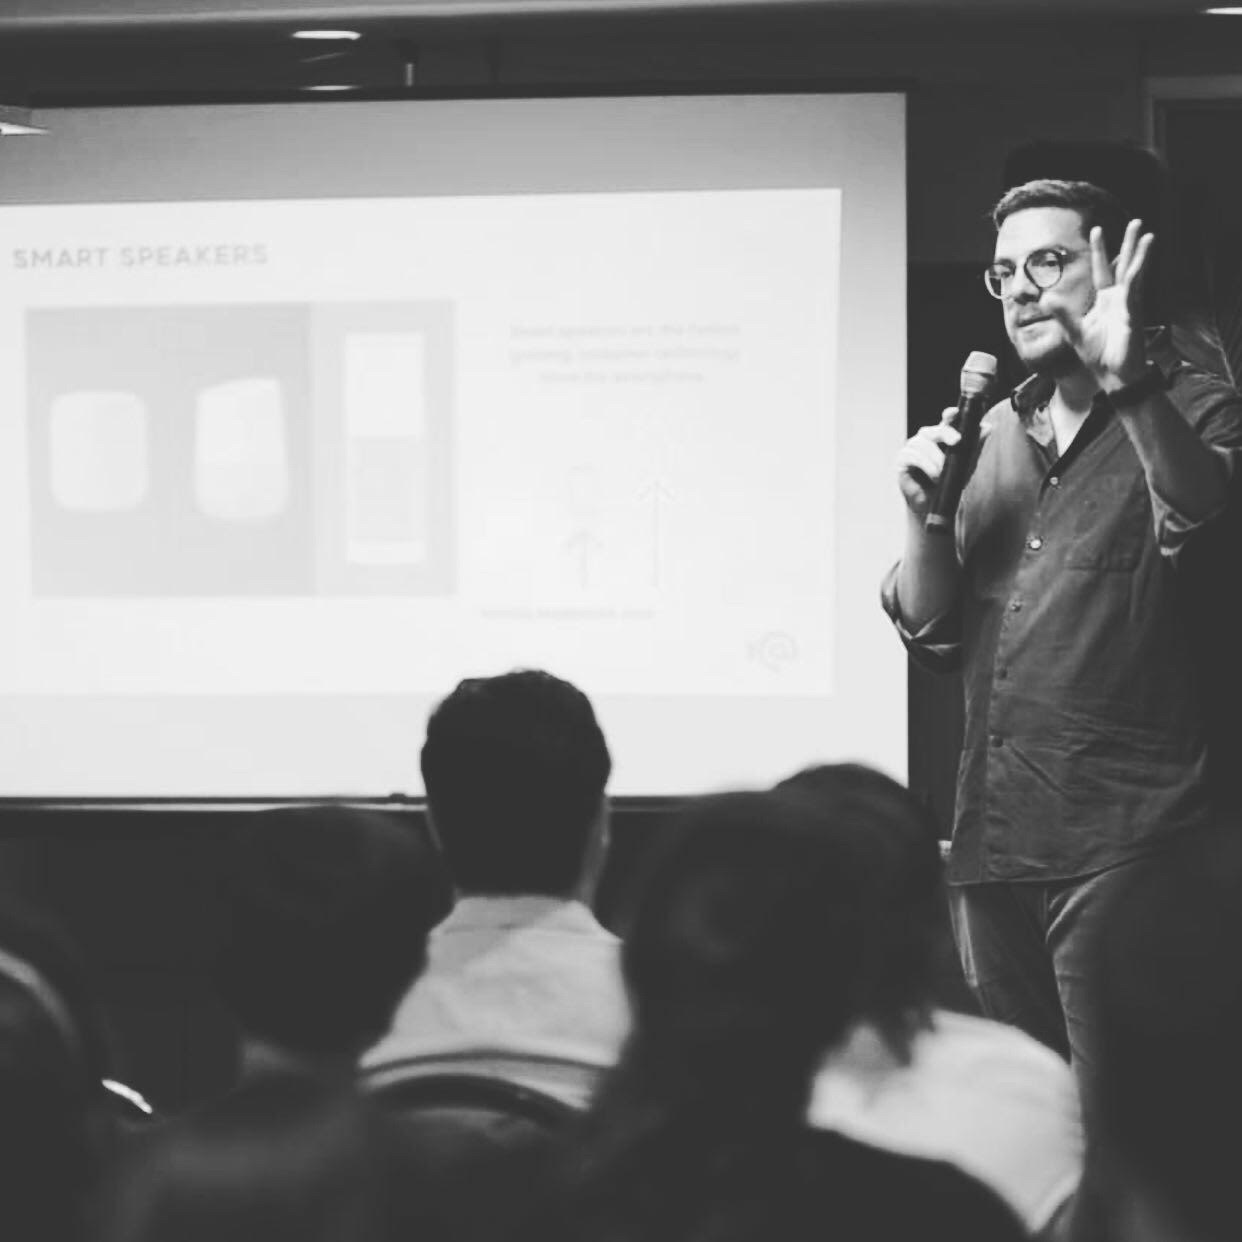 Marketing Conversacional, Chatbots, Voicebots, Digital Assistants, Smart Speakers